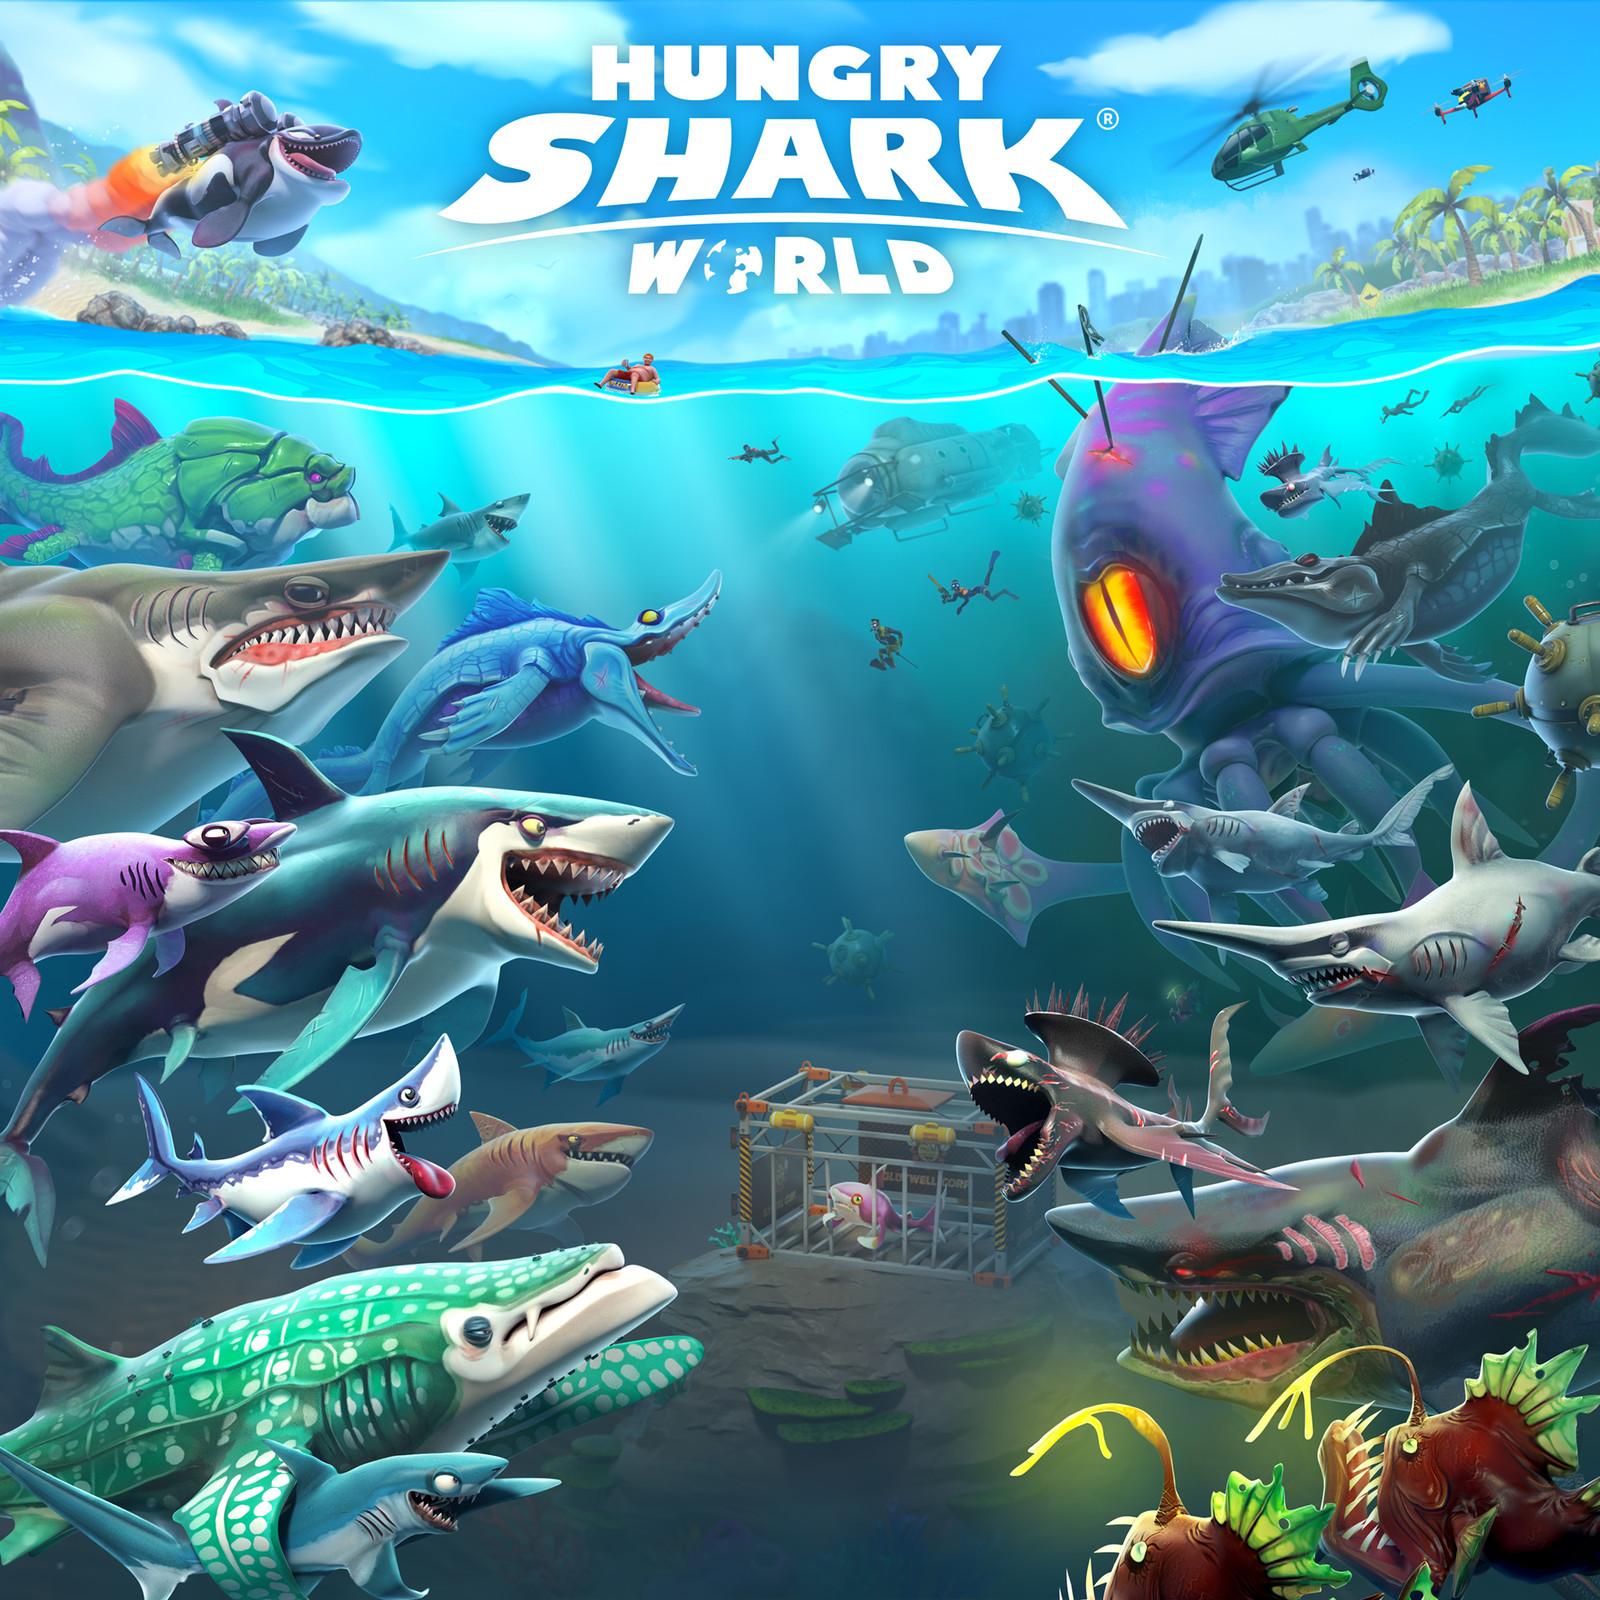 Hungry Shark World Keyart